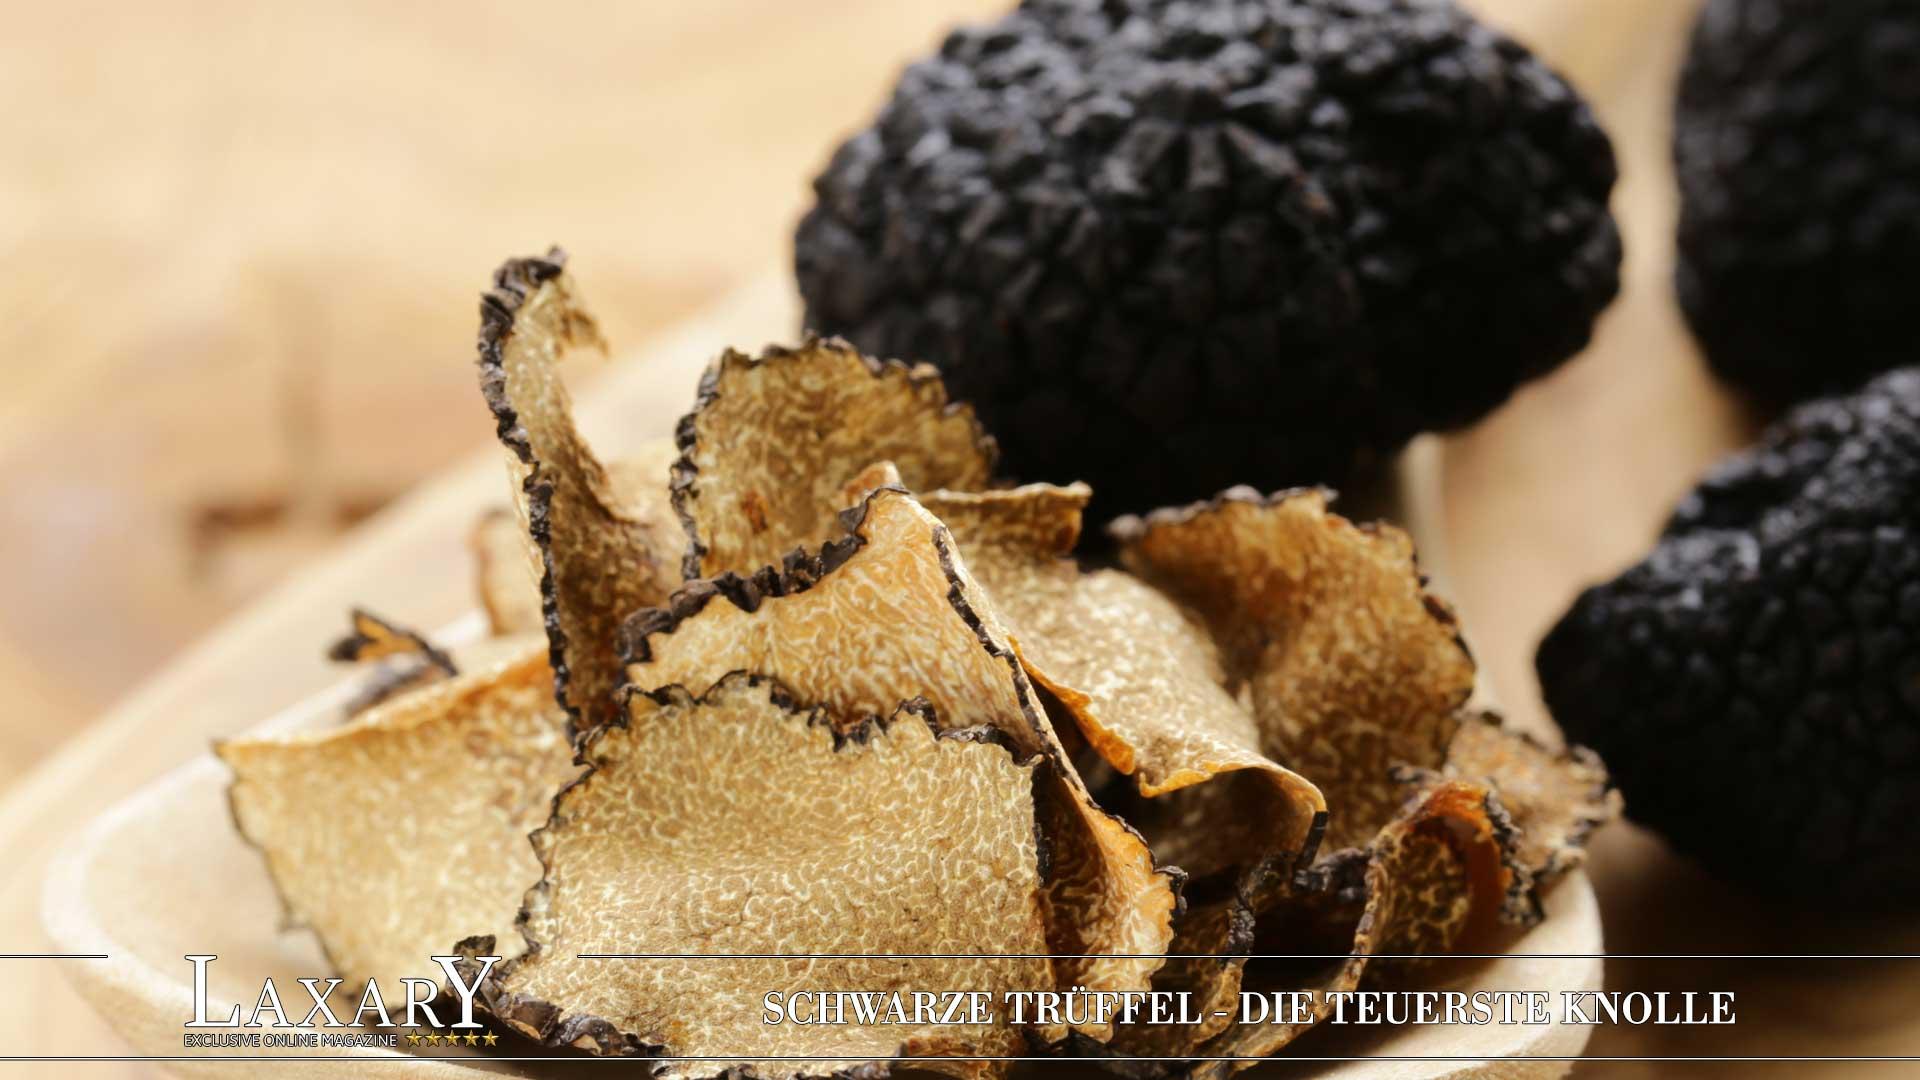 Die teuerste Knolle der Welt - Schwarze Trüffel